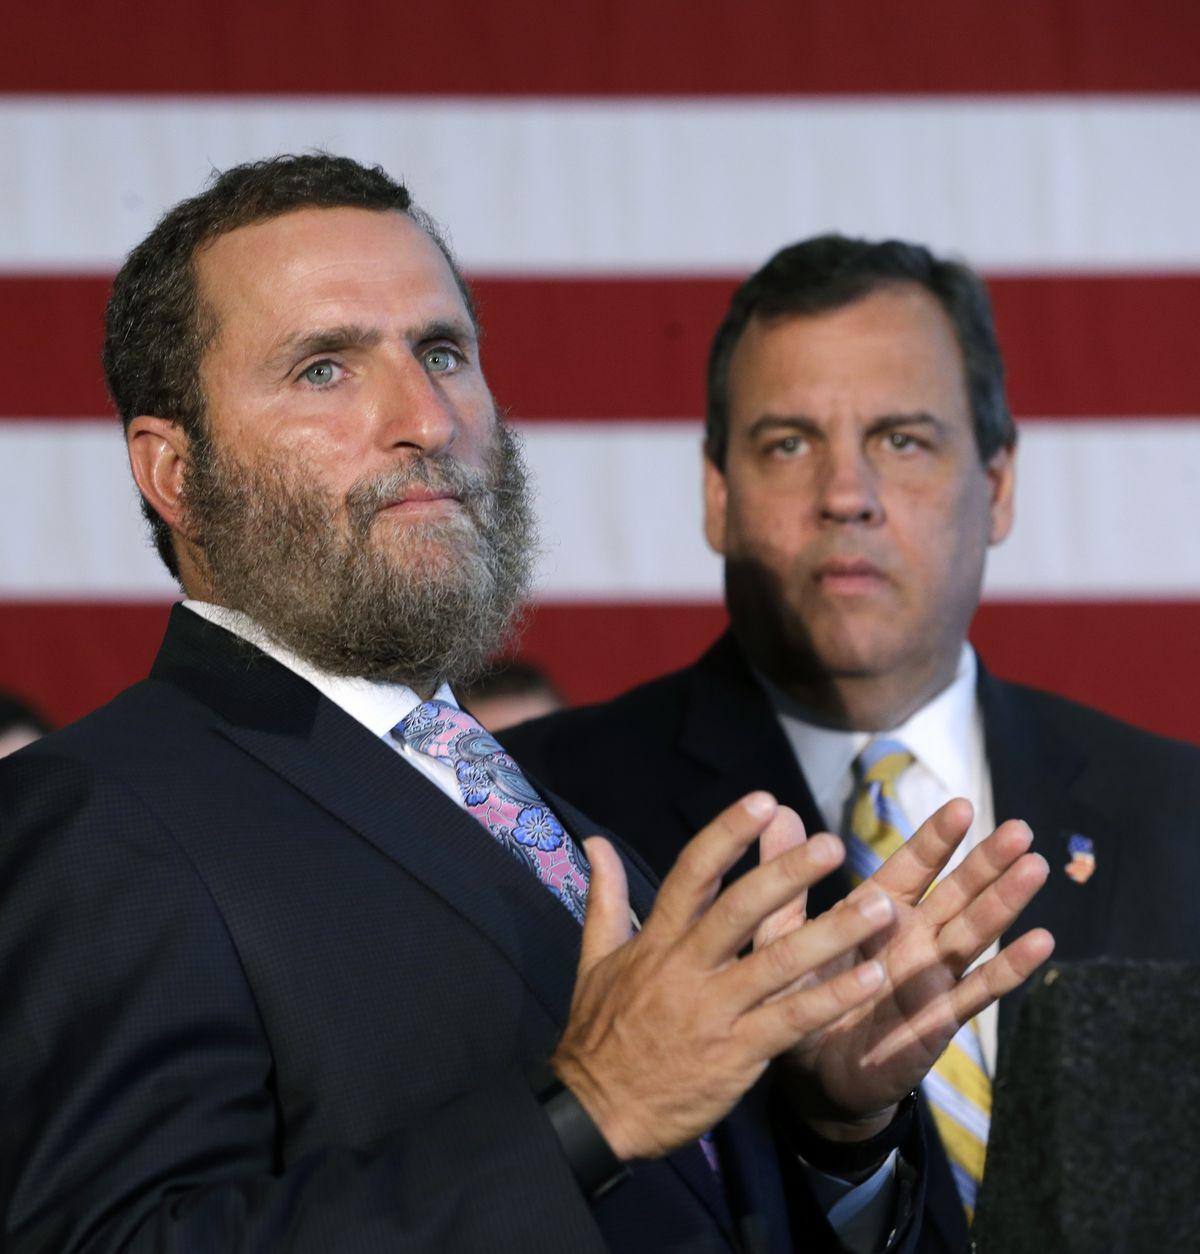 Chris Christie and Rabbi Shmuley Boteach speak at Rutgers University in New Brunswick, N.J.